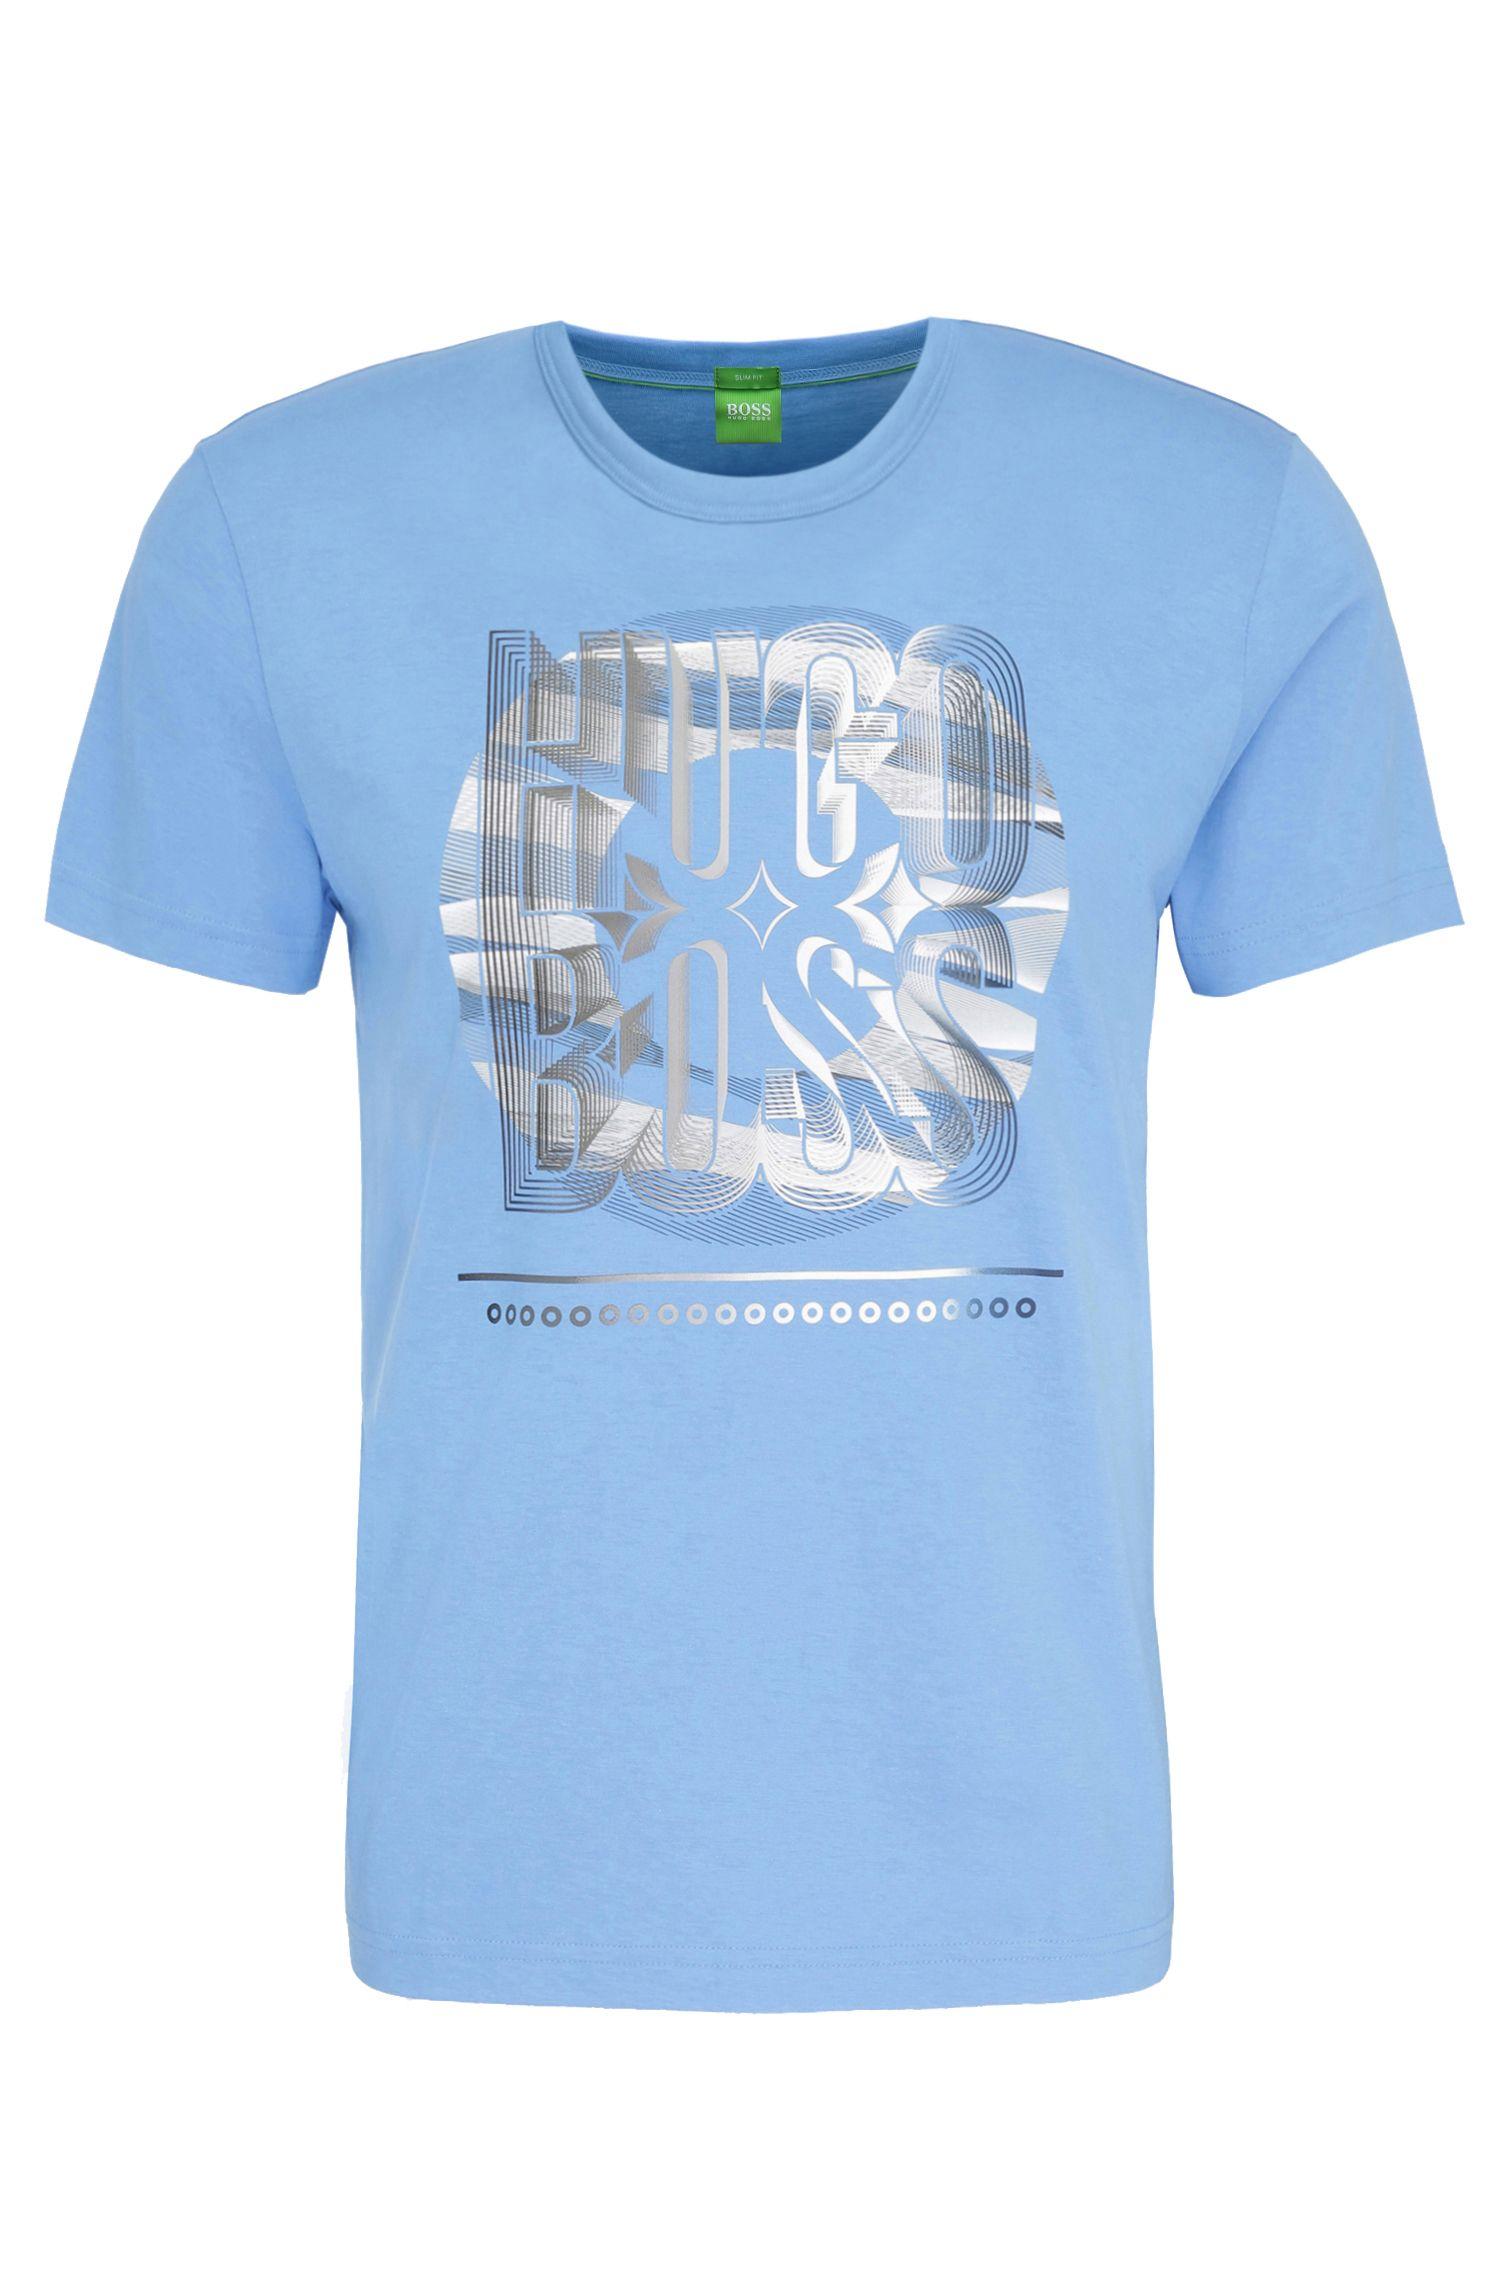 Regular-fit printed cotton shirt: 'Tee 3'